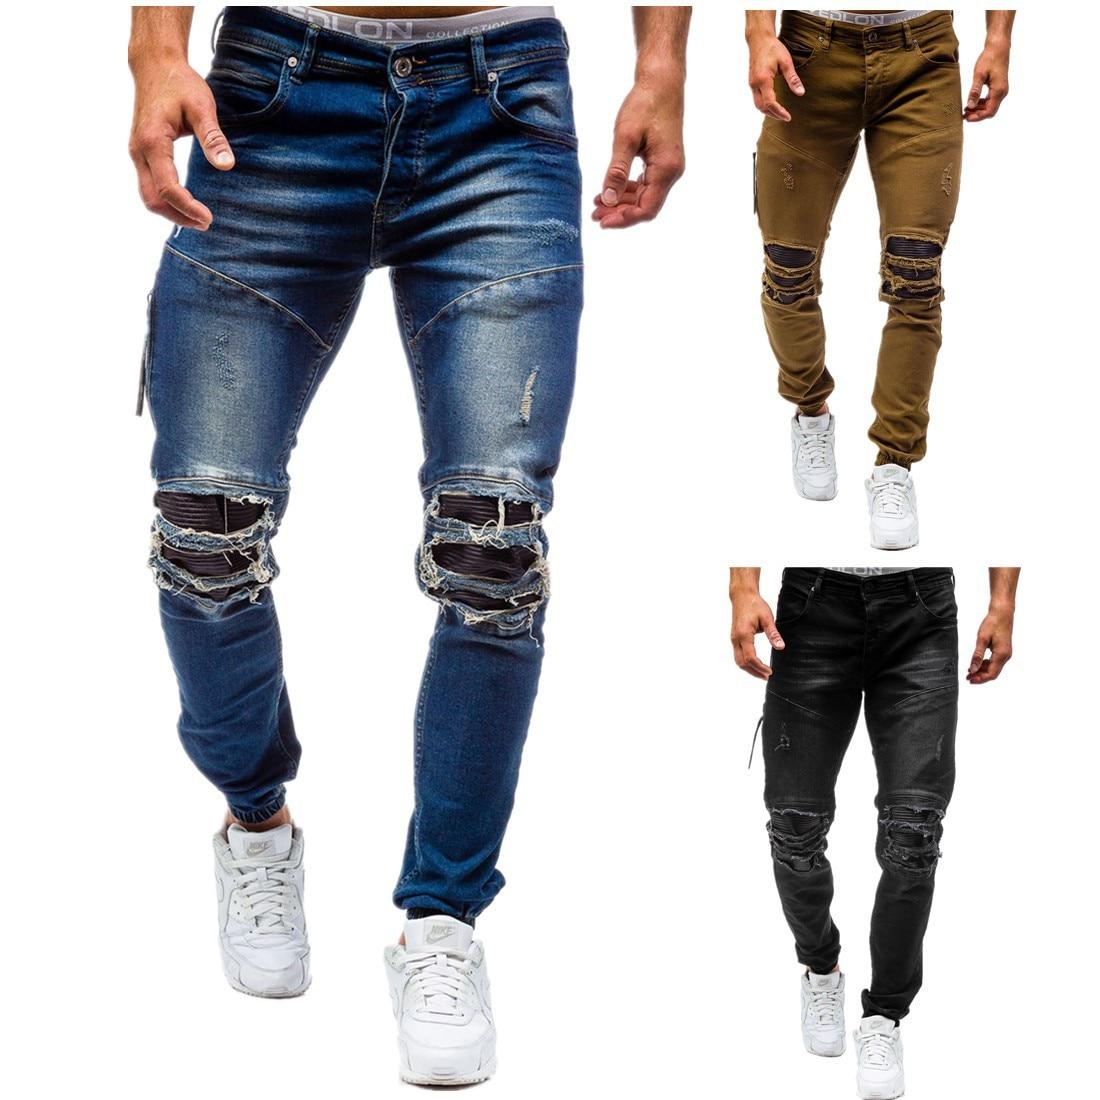 2017 Brand Male New Jeans Fashion Slim Beggar Hole Jeans Men Casual Pants Man Trousers Designer Mens Jeans